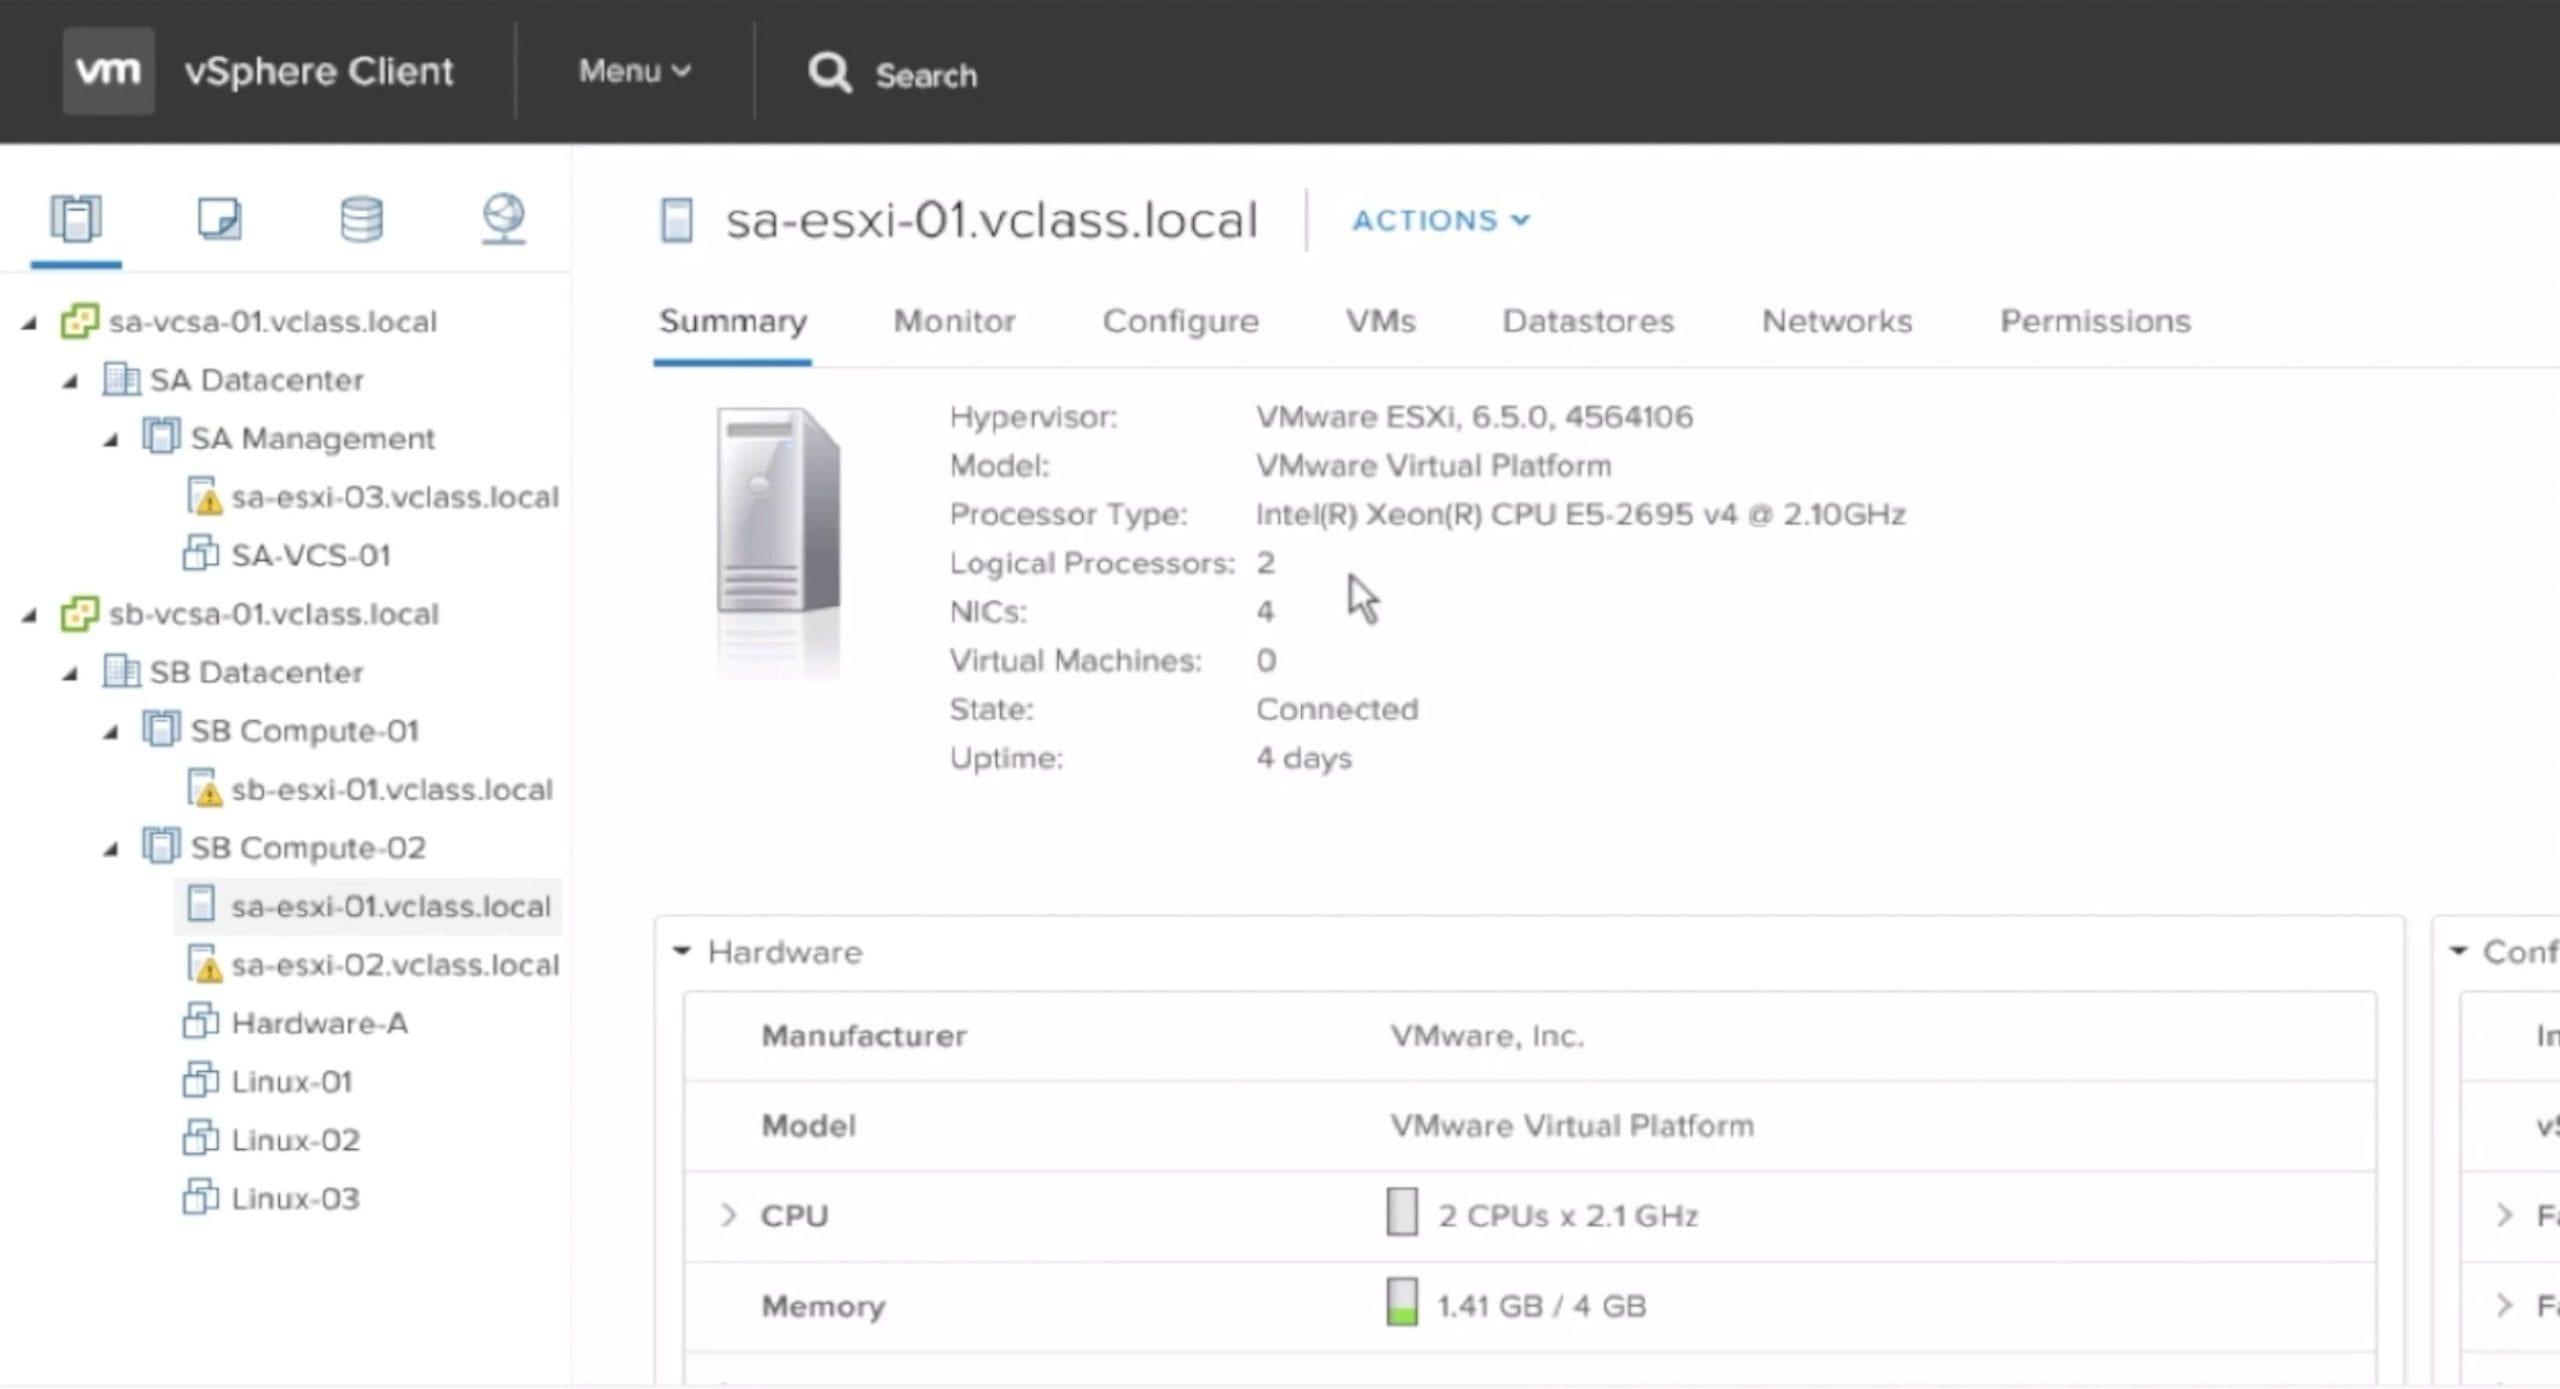 ¿Cómo hacer un backup de VMware vCenter Server Appliance 6.5?